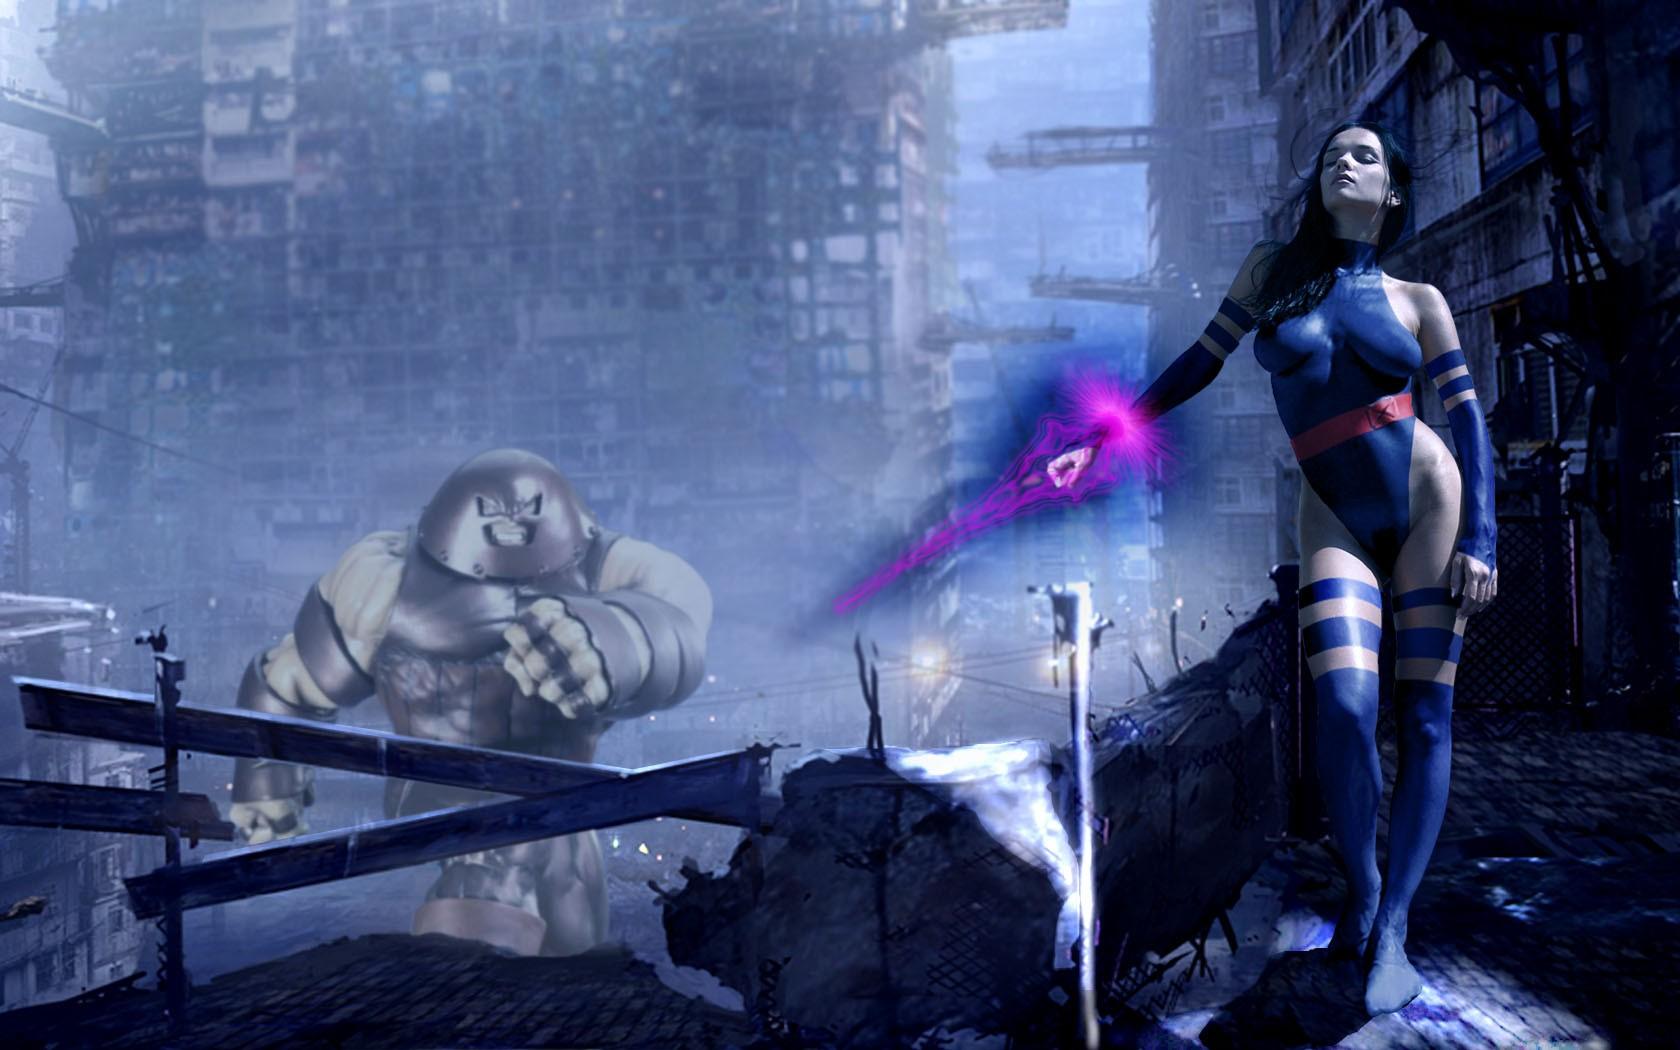 Cool Wallpaper Marvel Juggernaut - Juggernaut-superheroines-Katie-Fey-Psylocke-screenshot-computer-wallpaper-fictional-character-special-effects-pc-game-344940  Pictures_65649.jpg